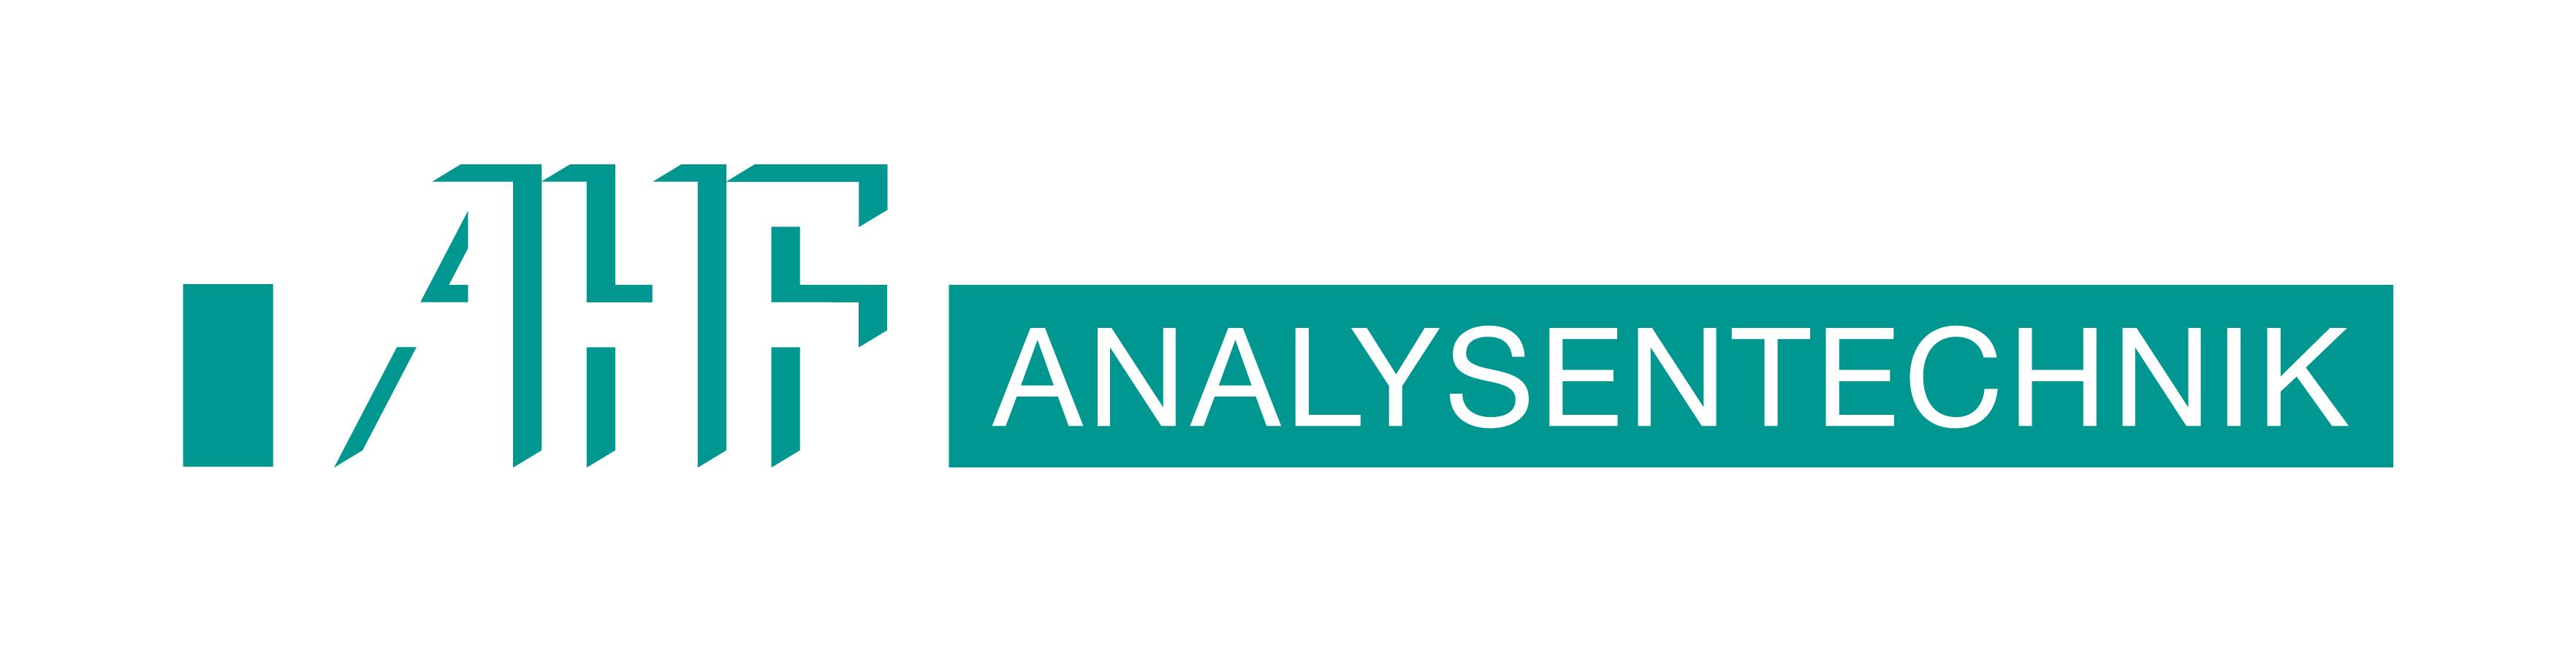 AHF analysentechnik